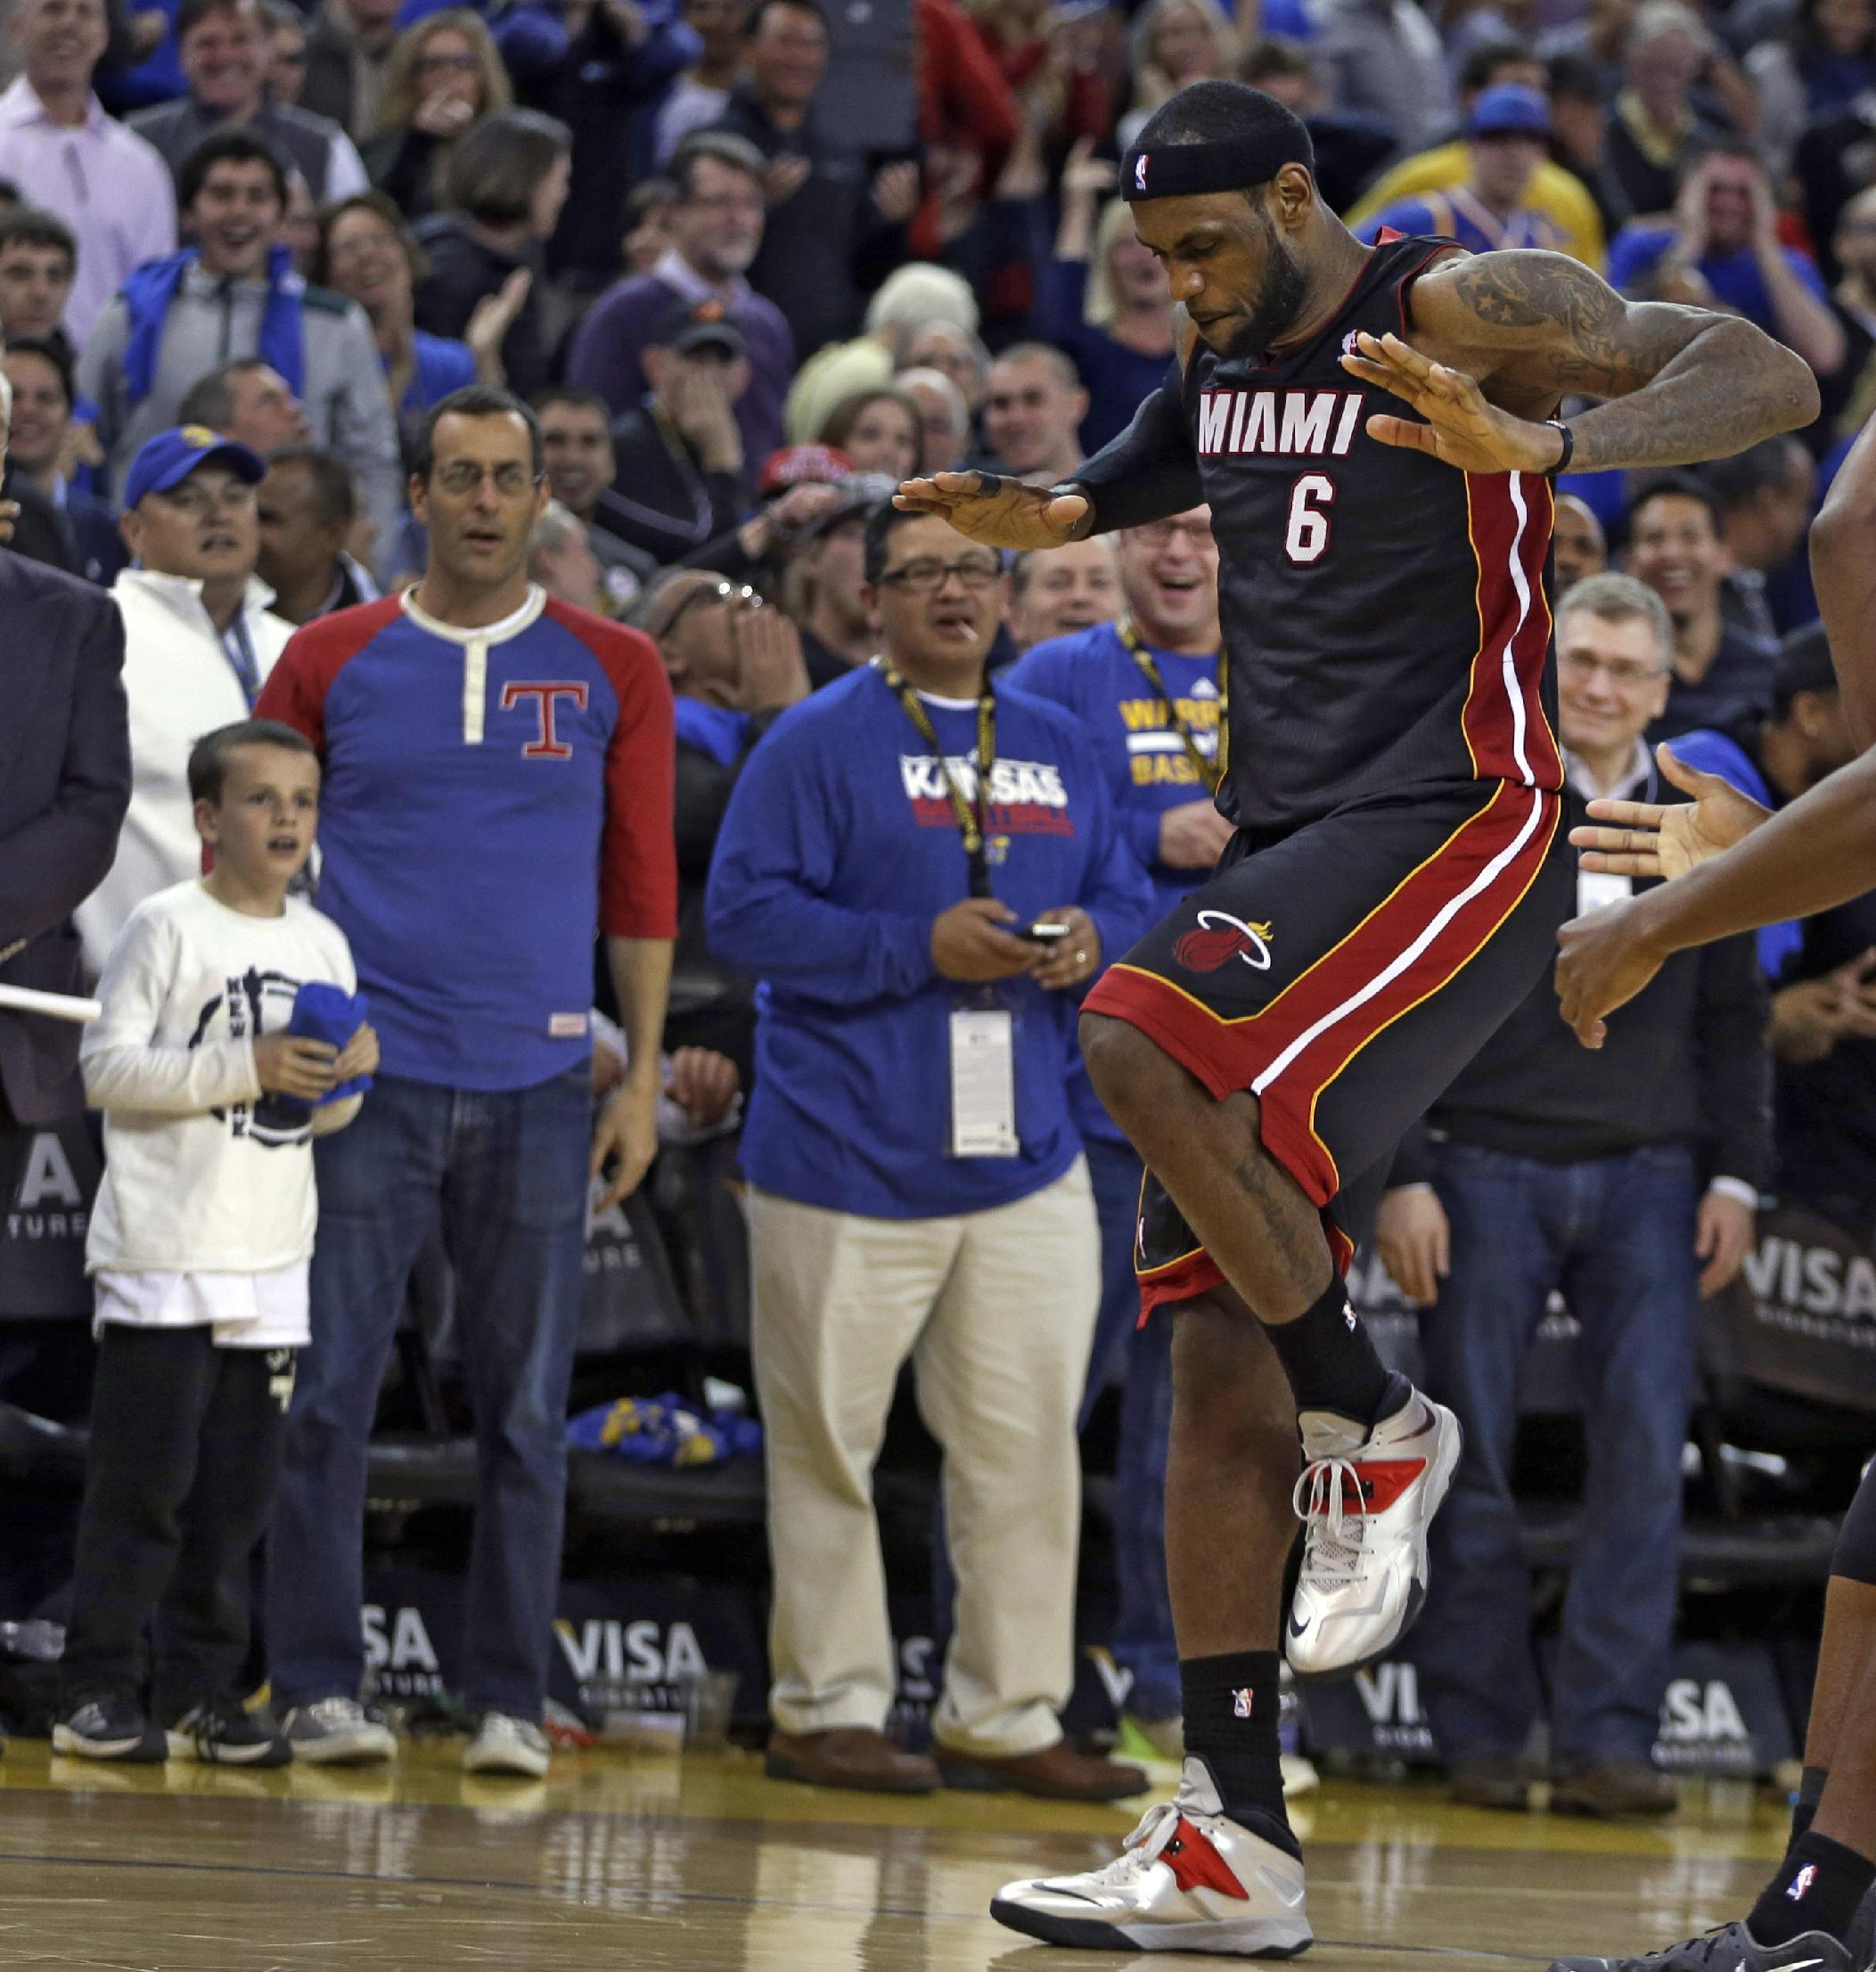 James' 3-pointer lifts Heat past Warriors, 111-110